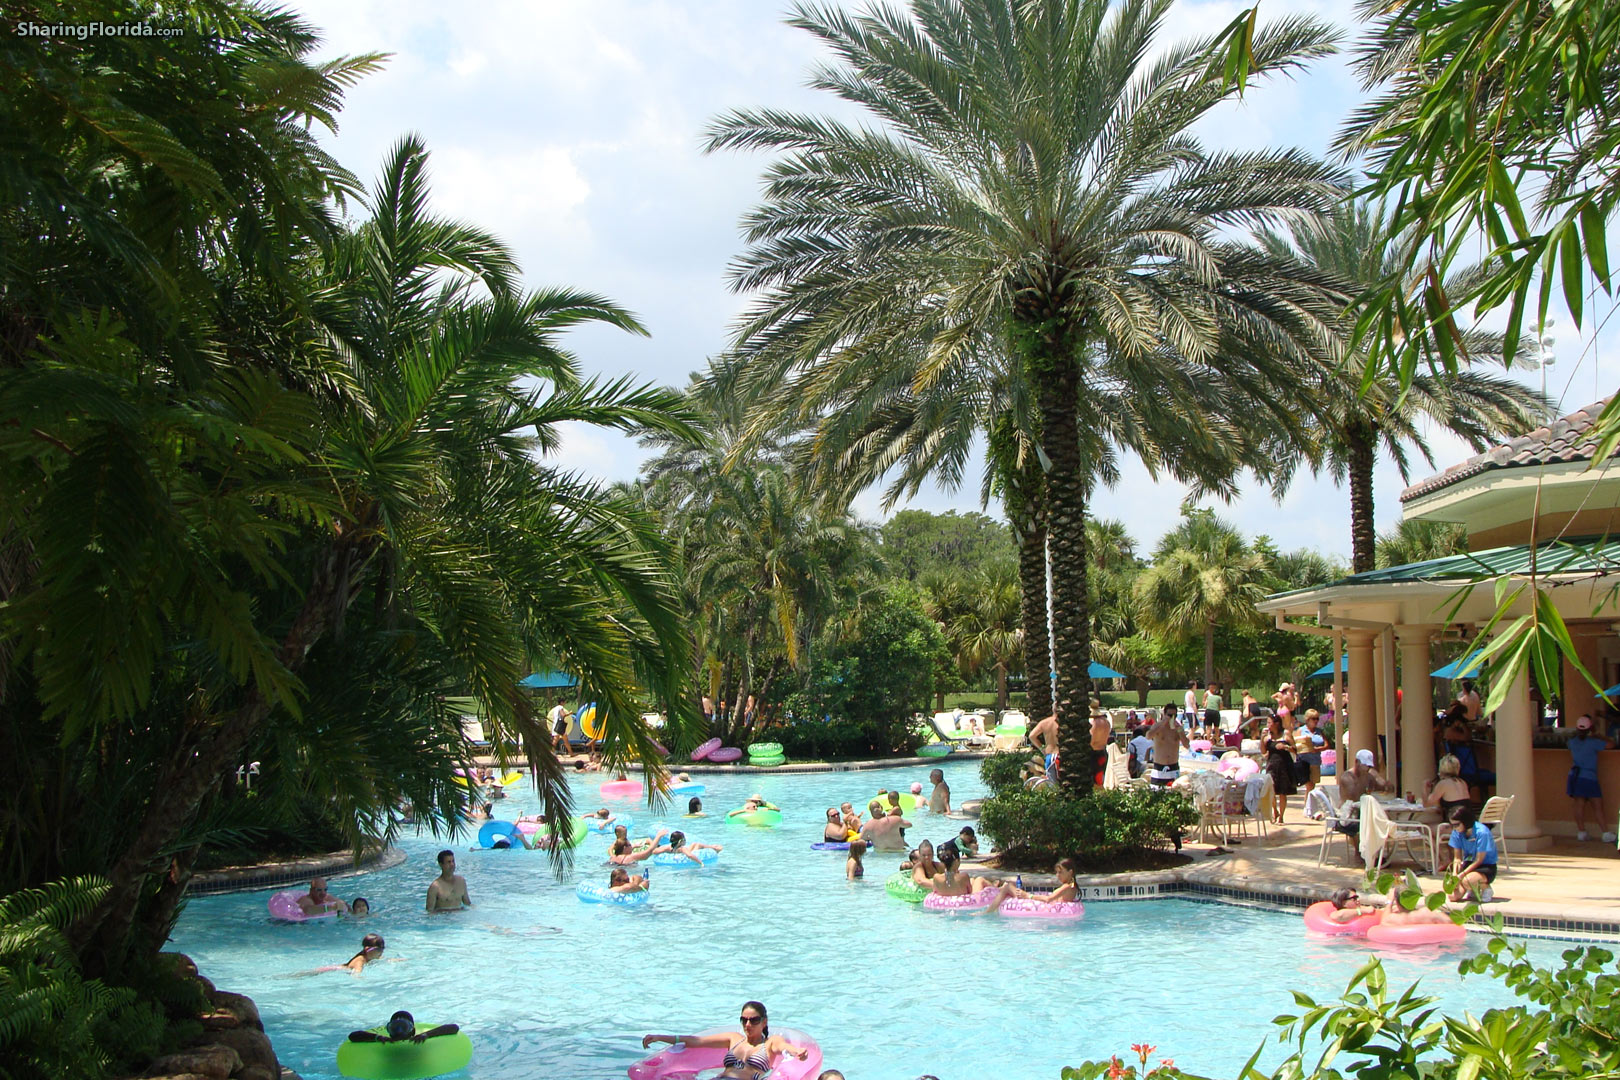 Florida Swimming Pool Wallpaper   Lazy River Wallpaper from Orlando 1620x1080